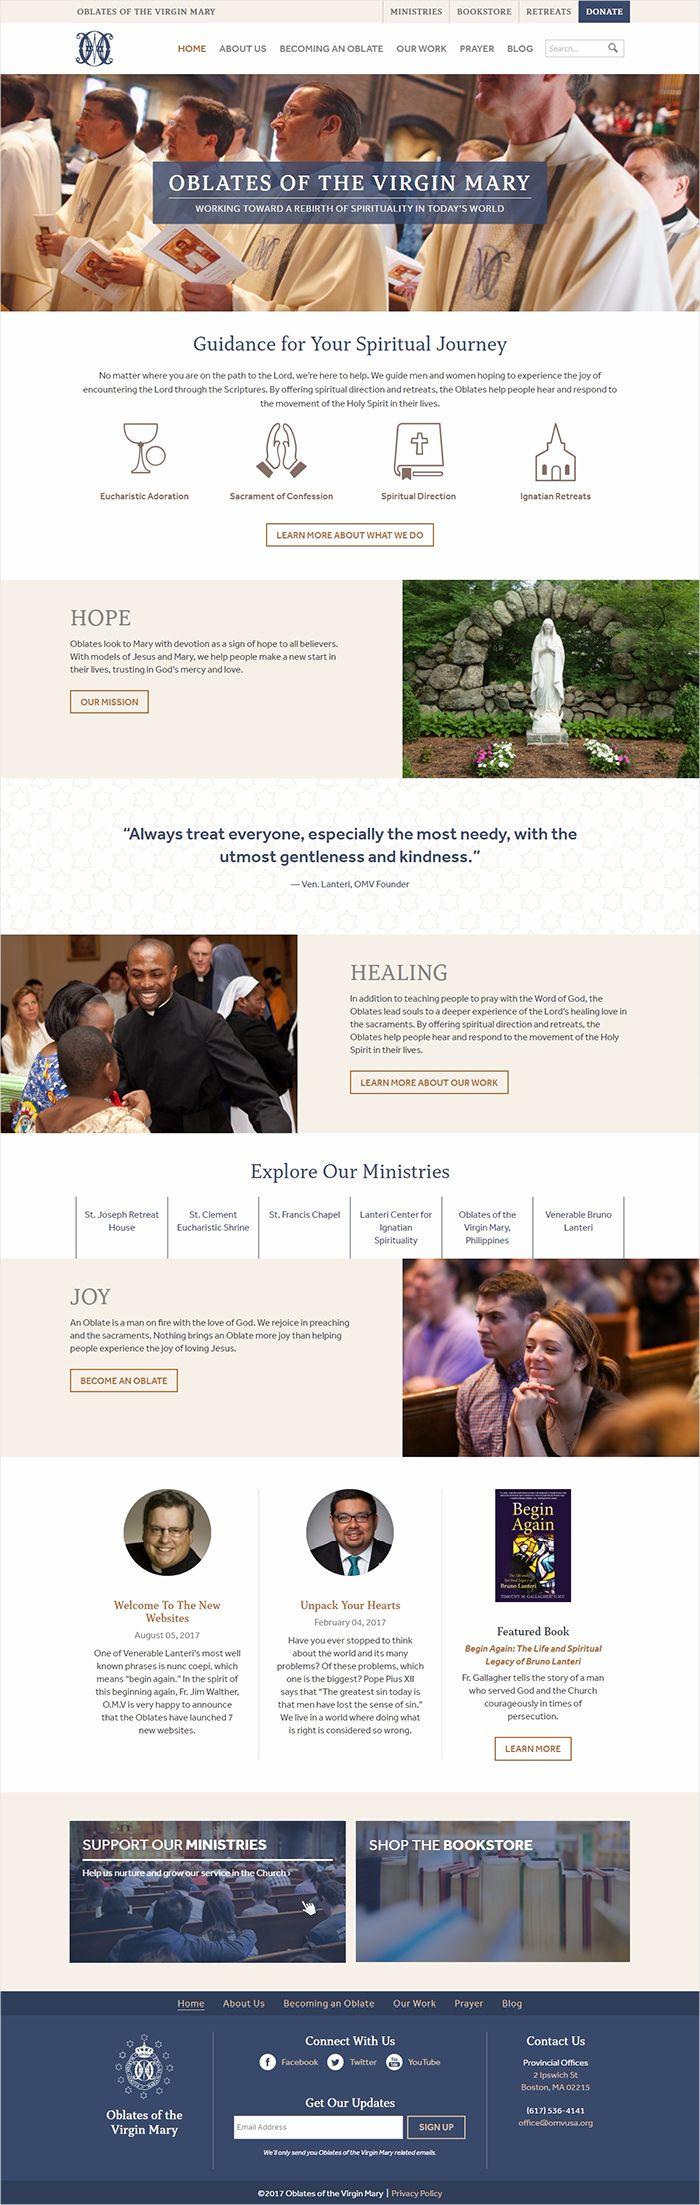 Portfolio Wired Impact Spiritual Journey Spiritual Guidance Virgin Mary